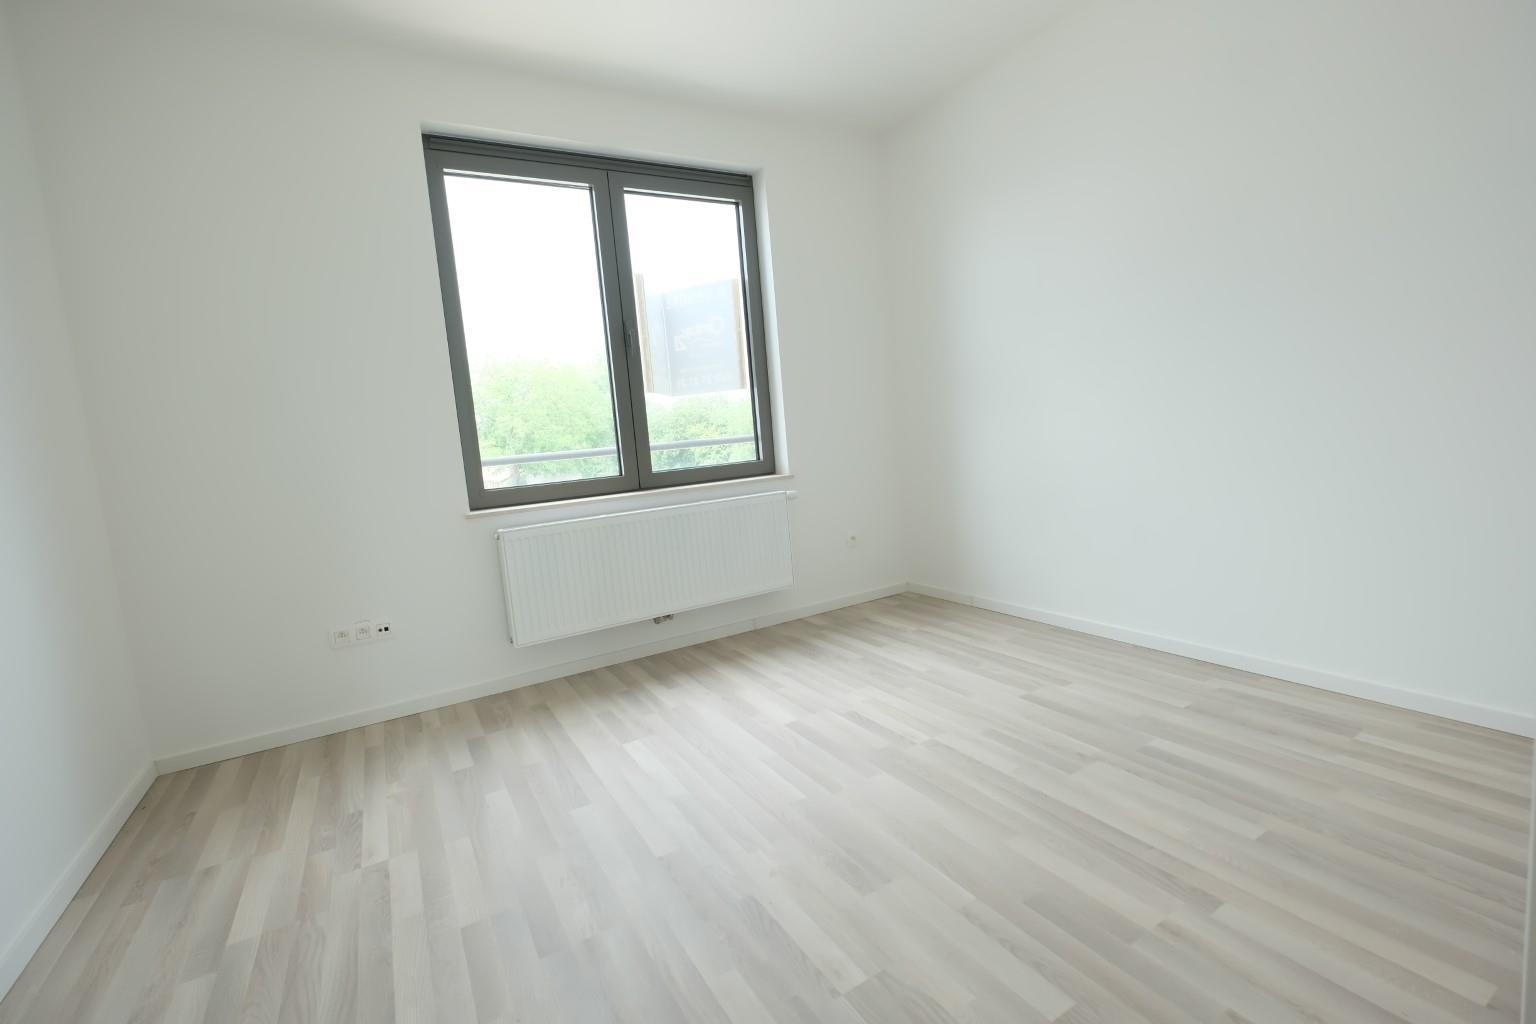 Appartement - Soignies - #3015957-15